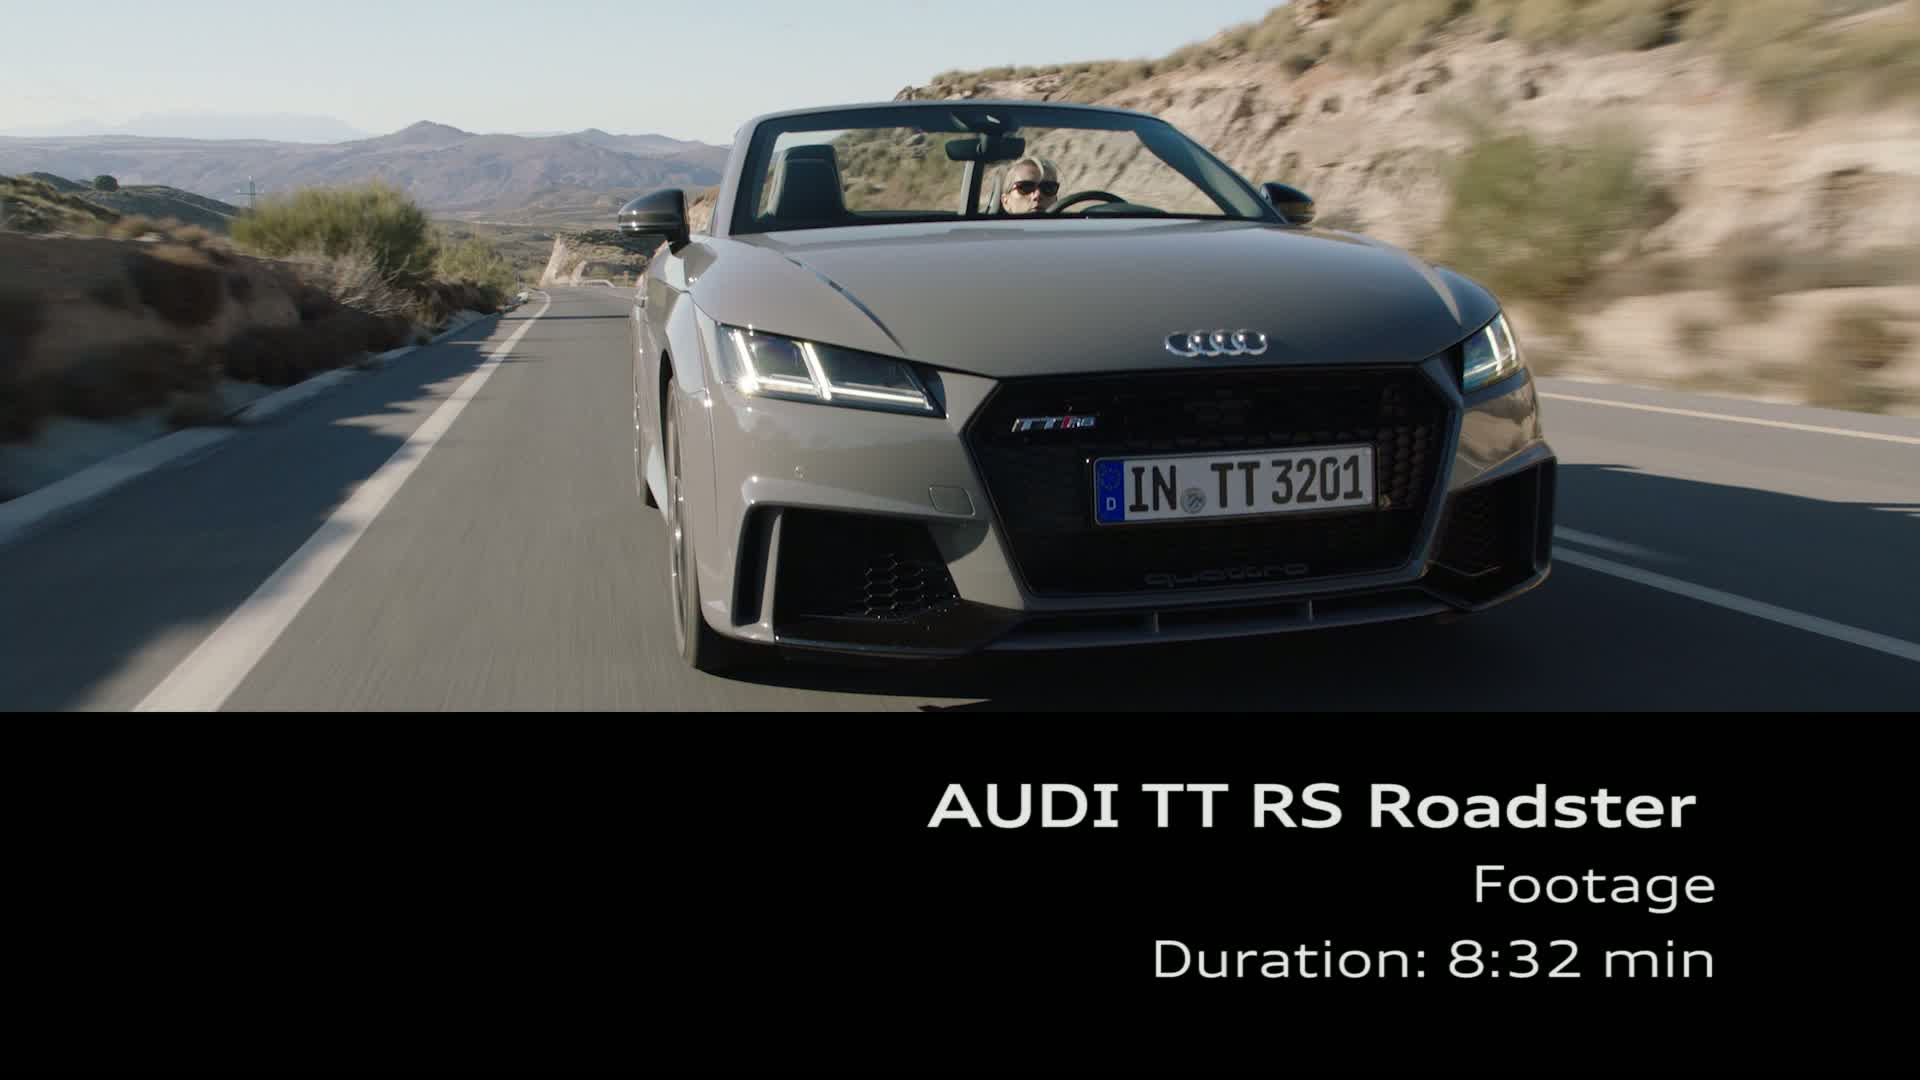 Audi TT RS Roadster - Footage